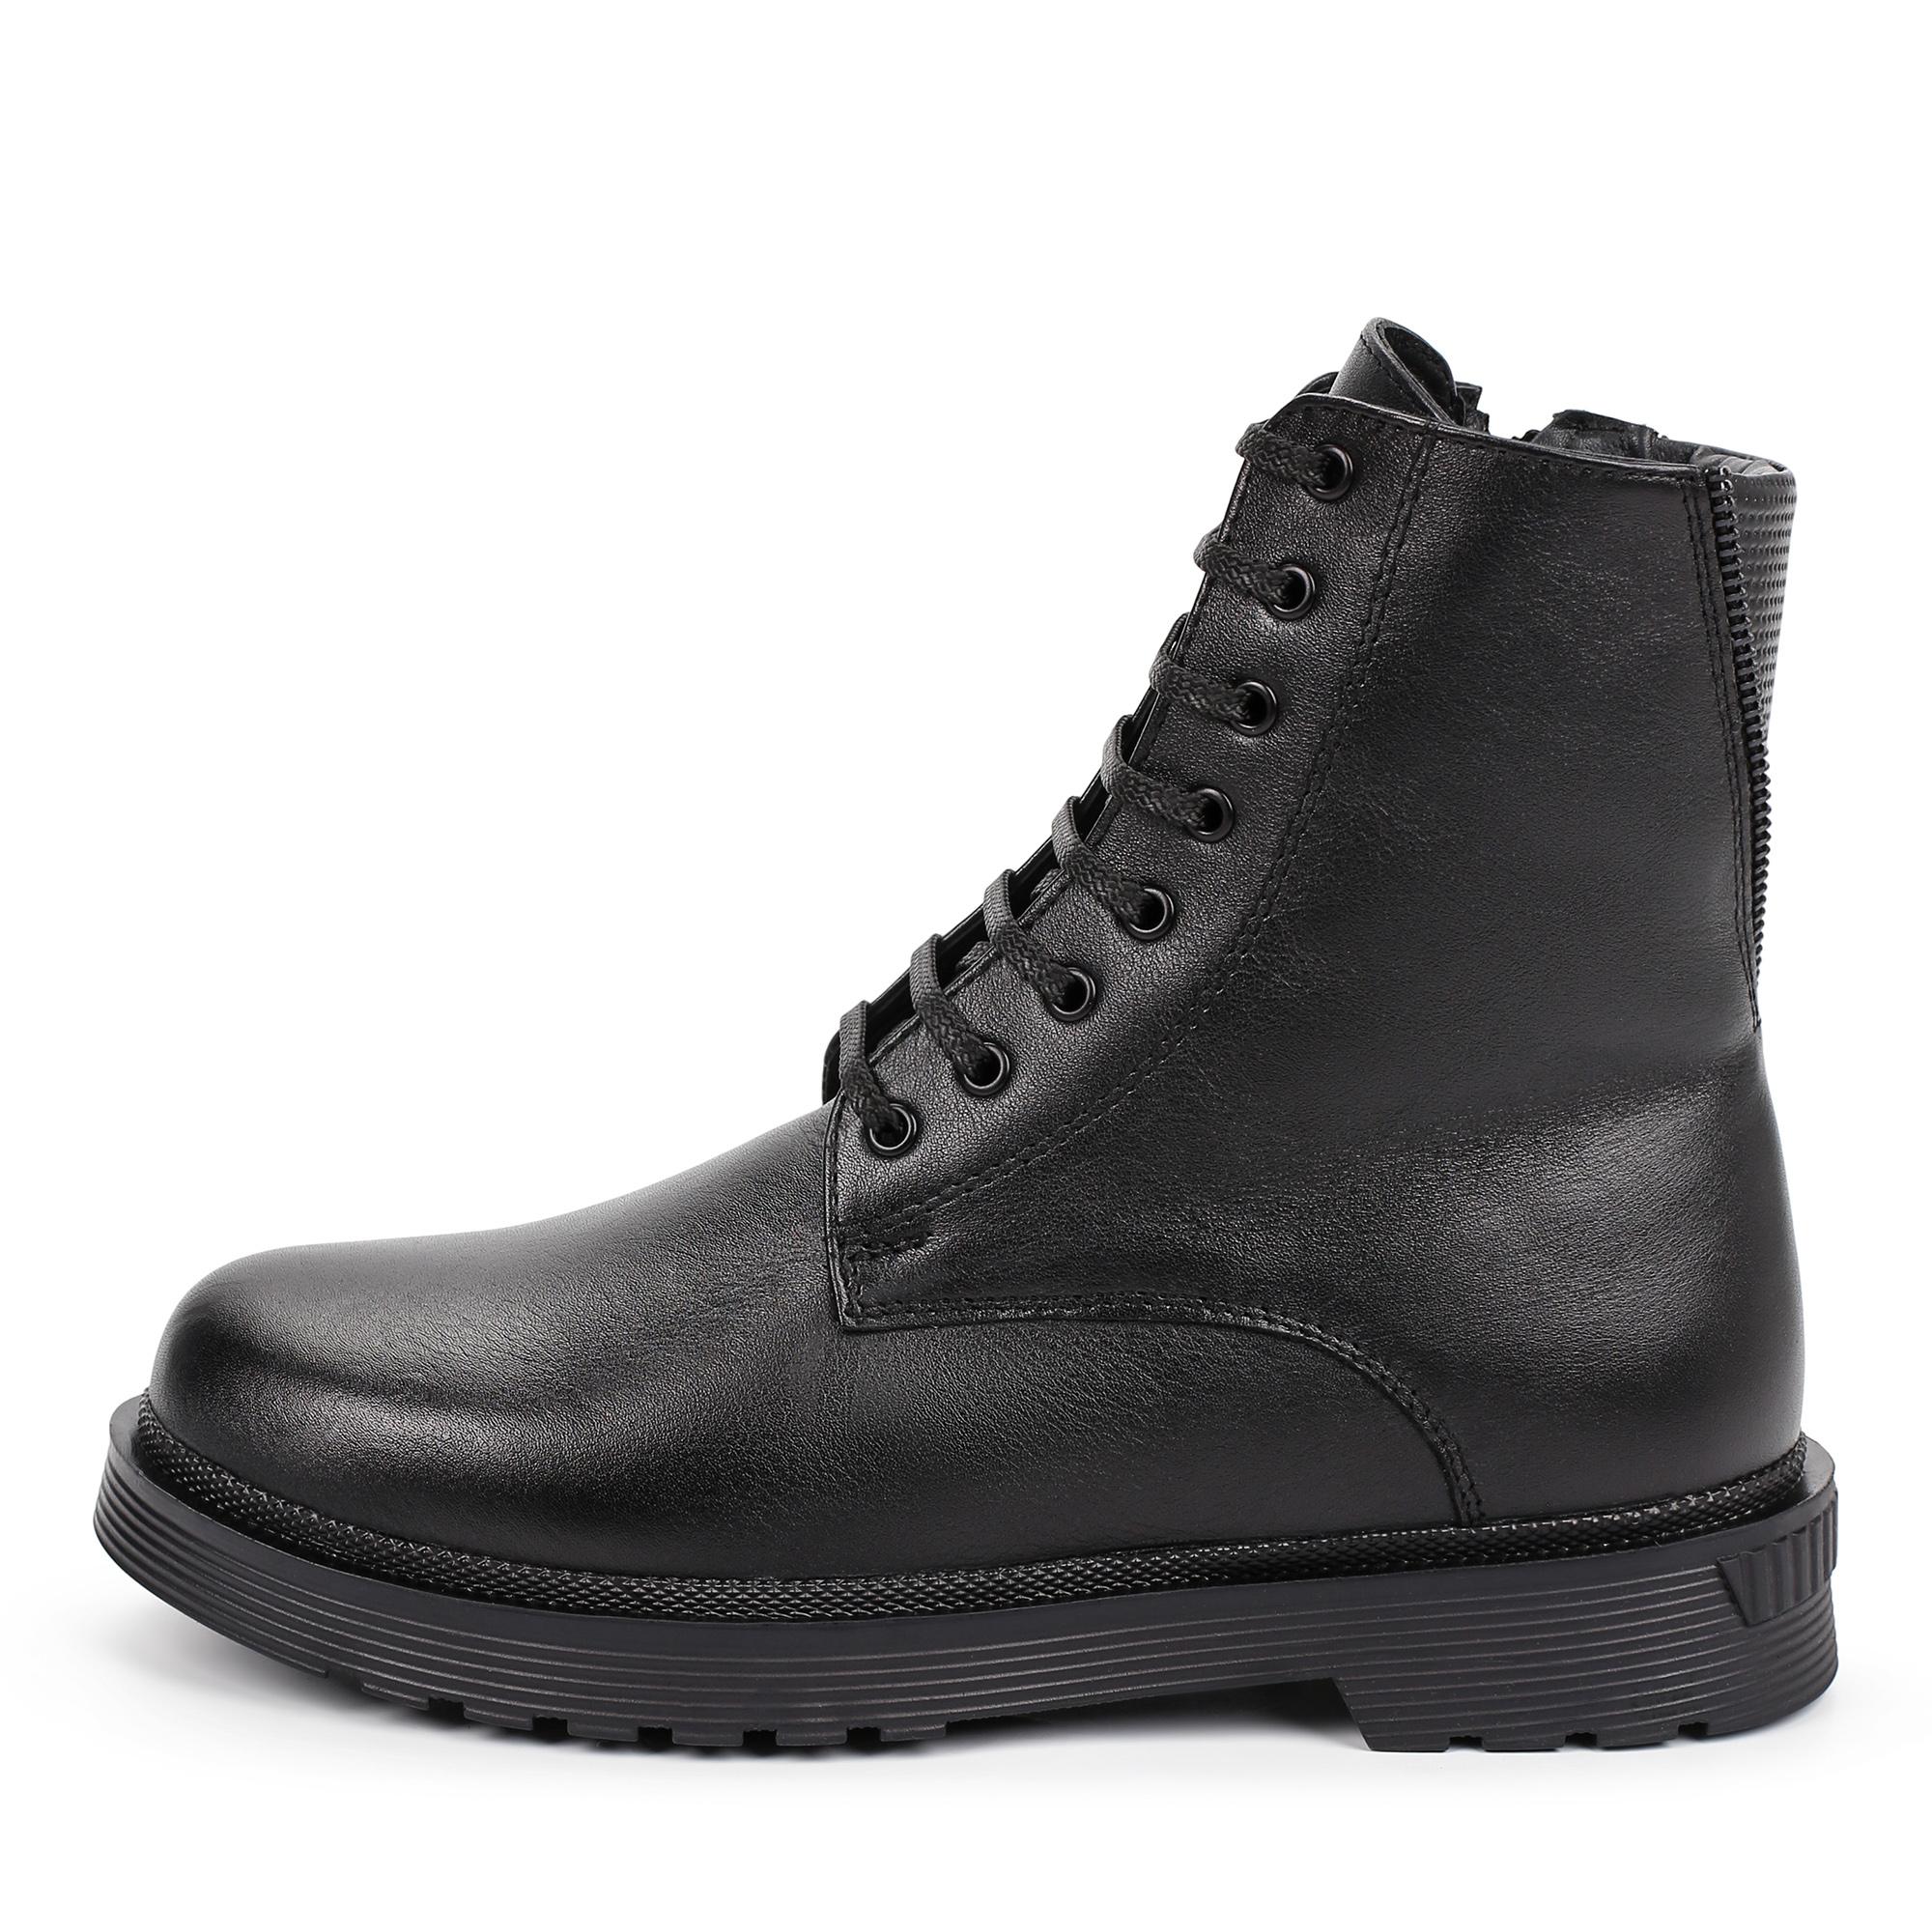 Ботинки Thomas Munz 302-004A-5102